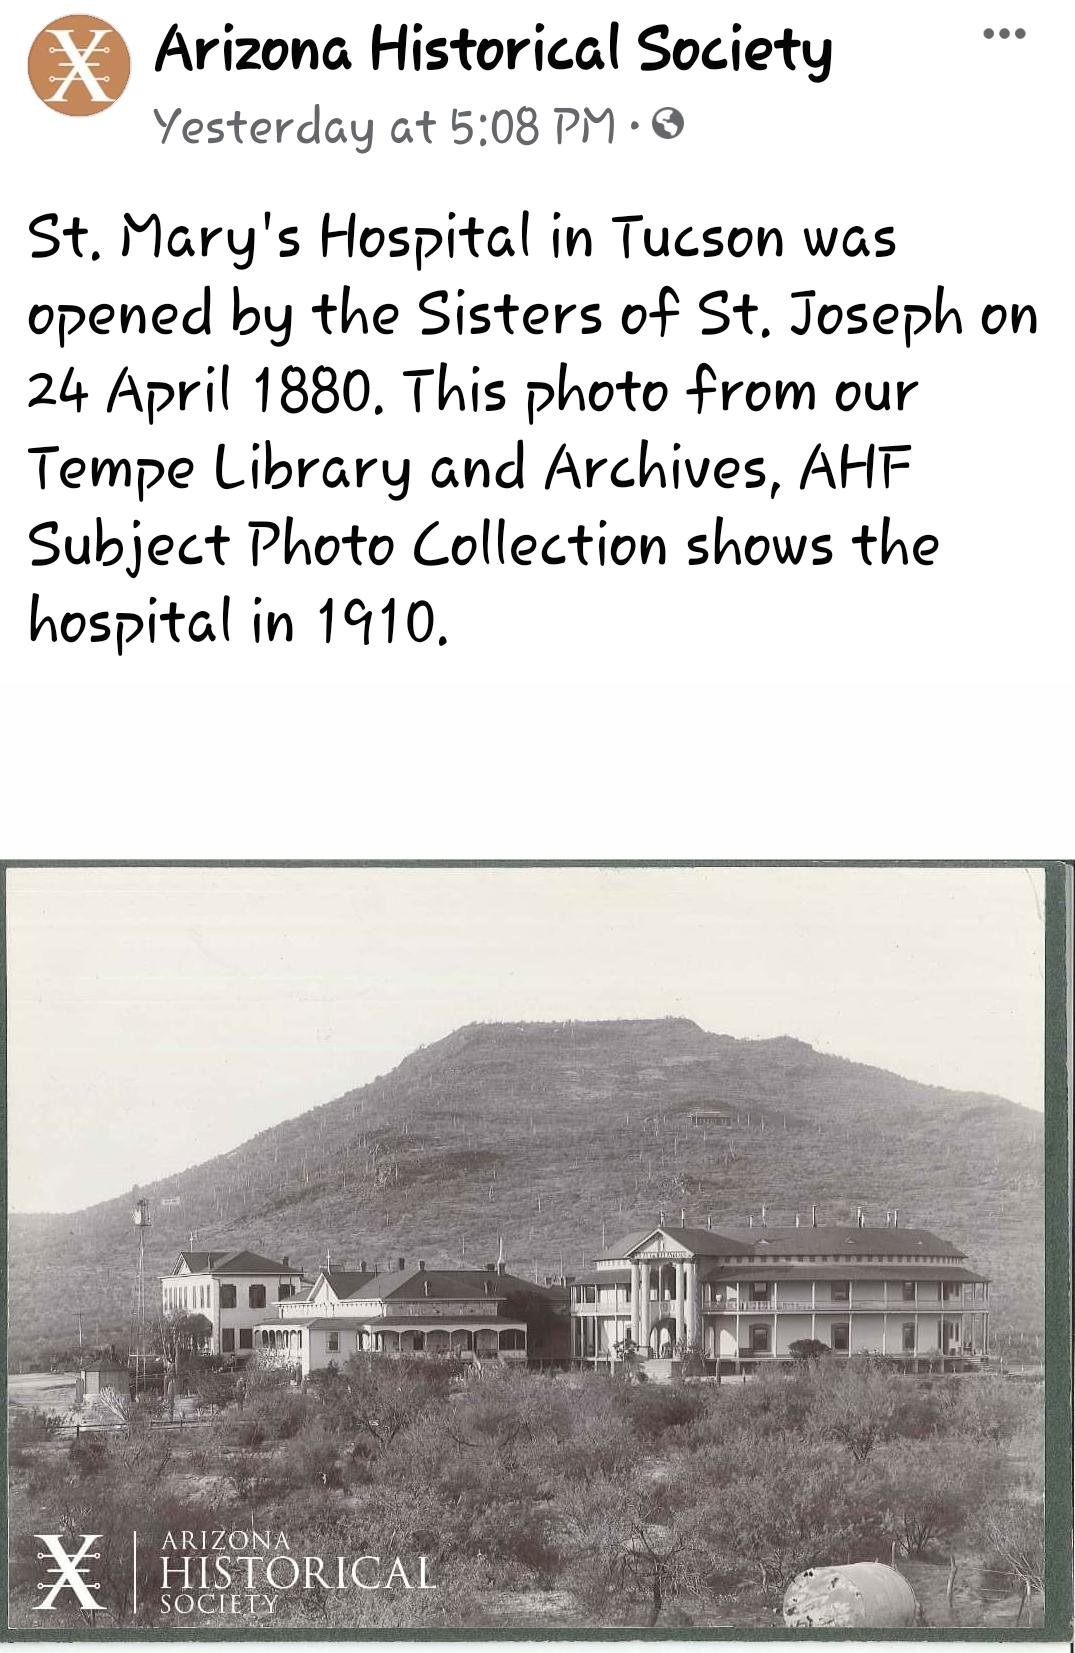 Courtesy of Arizona Historical Society on Facebook